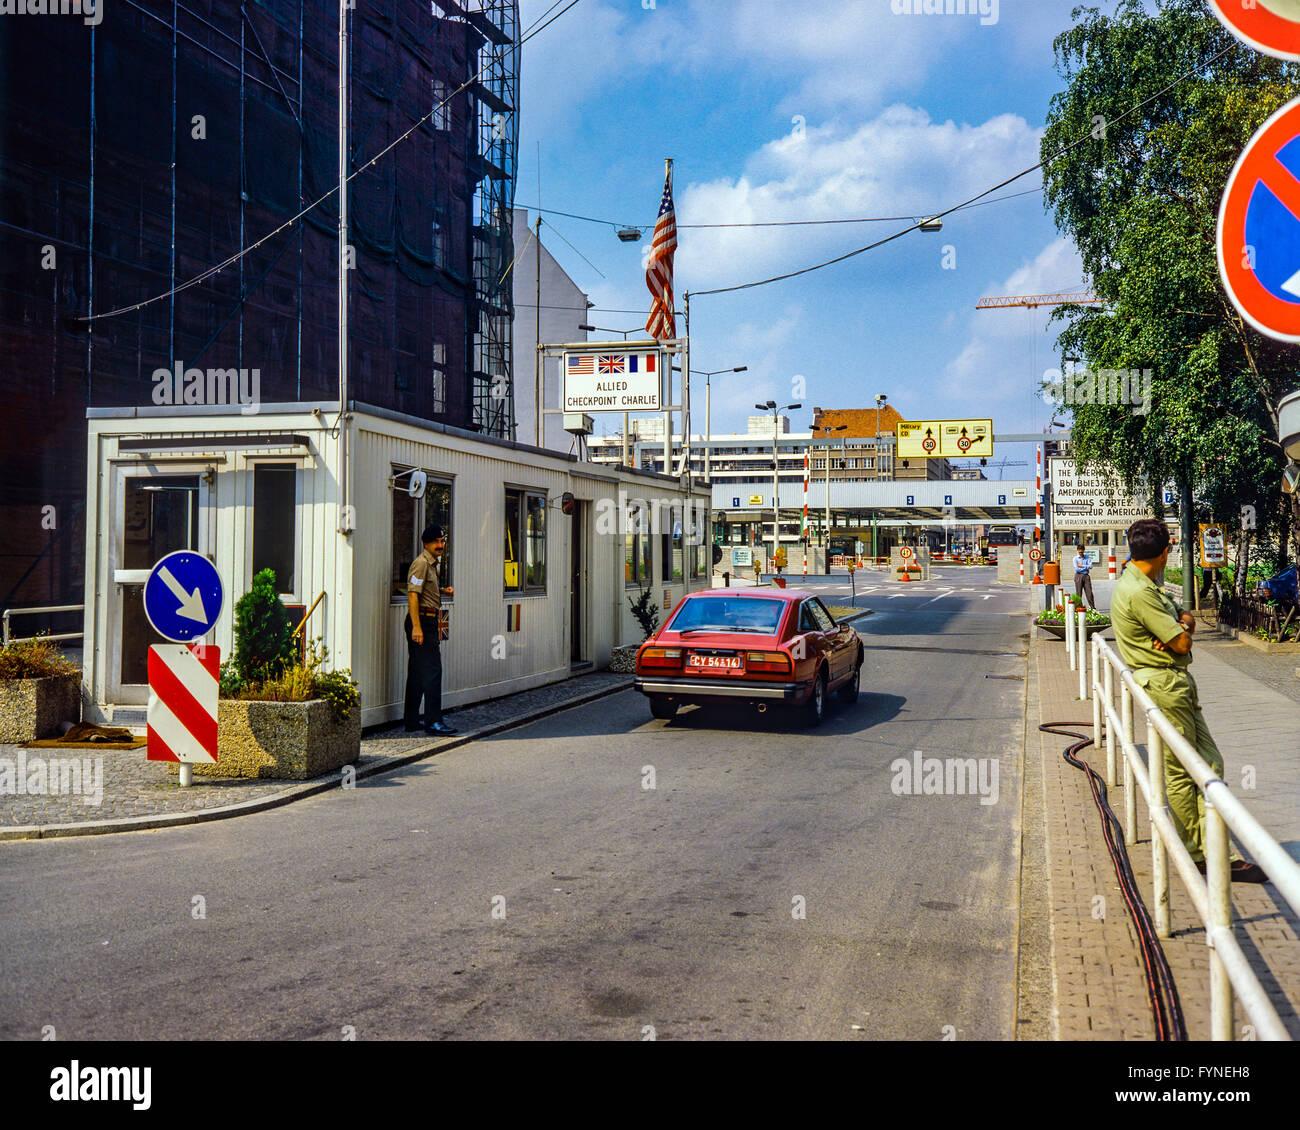 Agosto de 1986, Allied Checkpoint Charlie, la policía militar británica, coche rojo, la calle Friedrichstrasse, Imagen De Stock